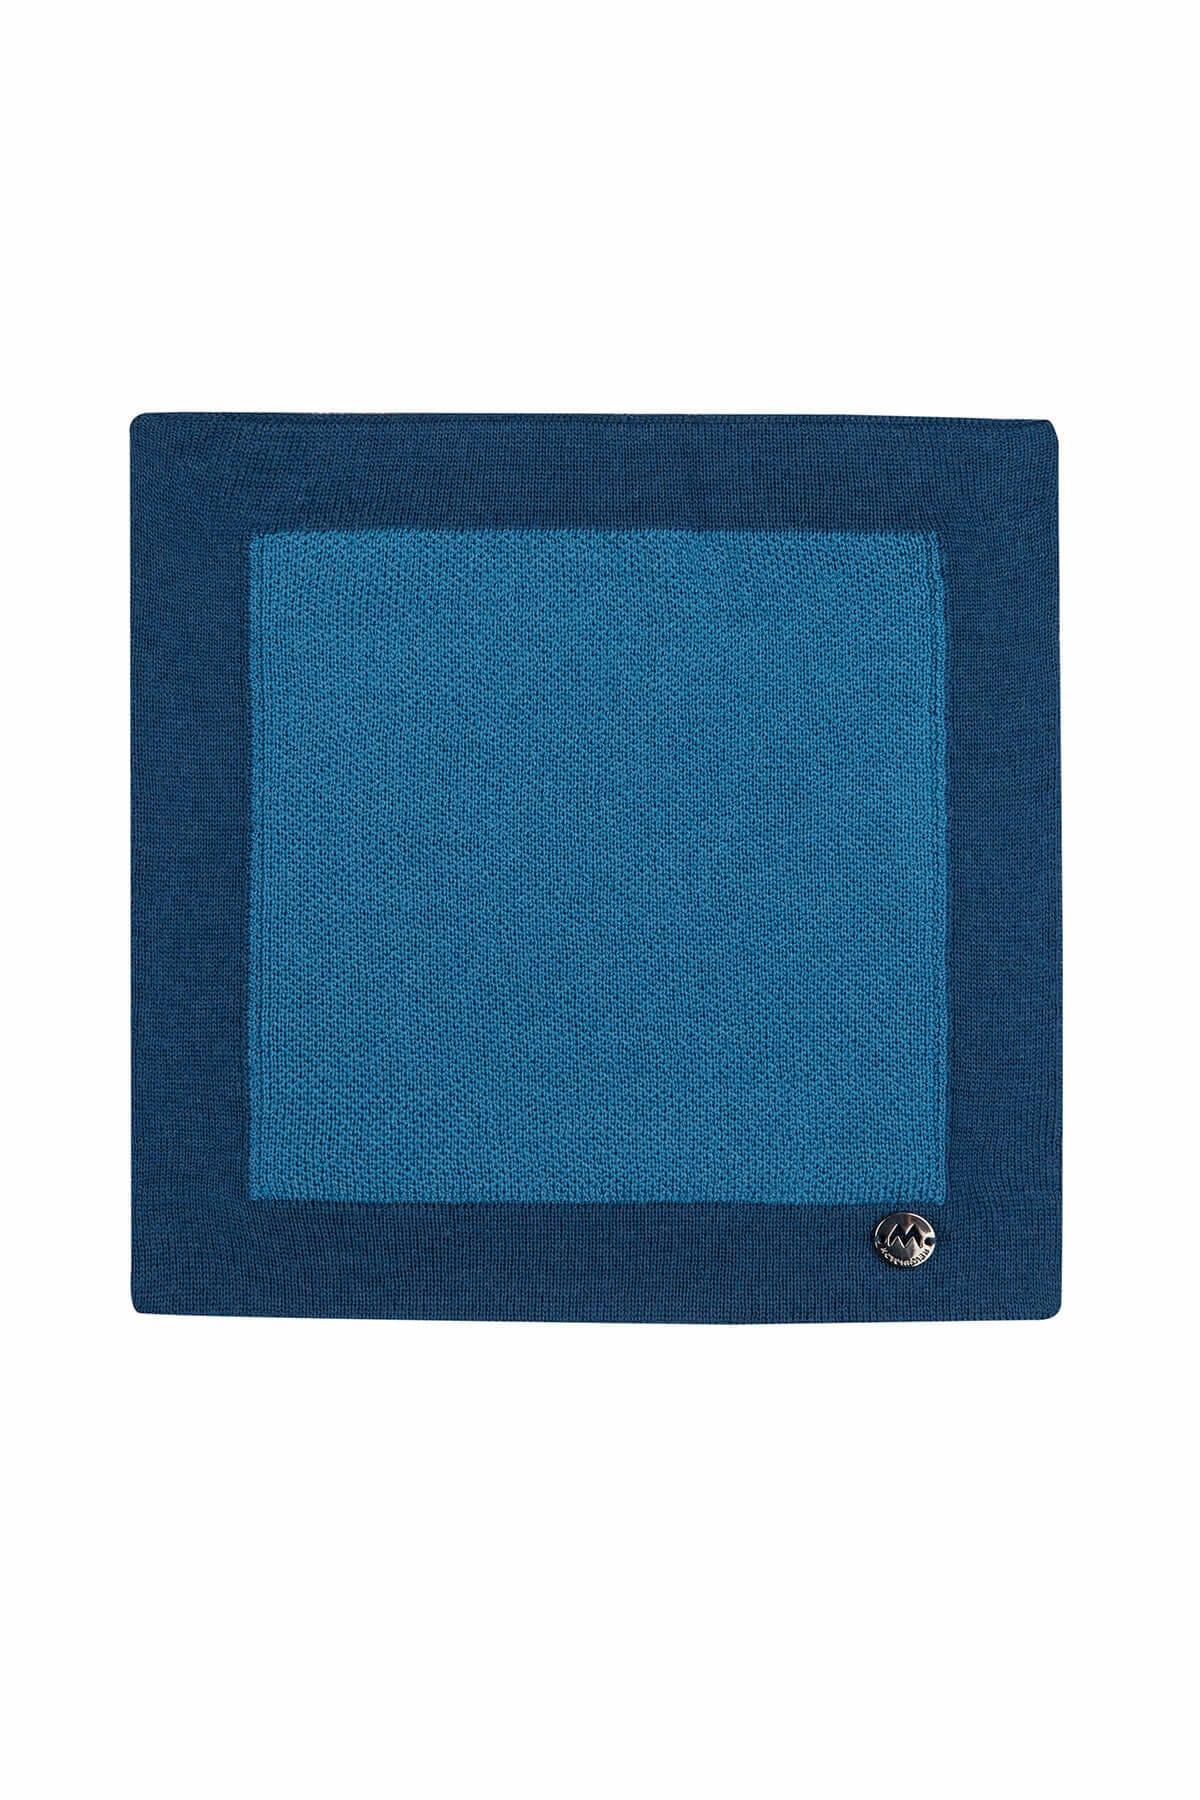 Hemington Erkek Mavi  Merino Yün Mendil  - 184951012 1